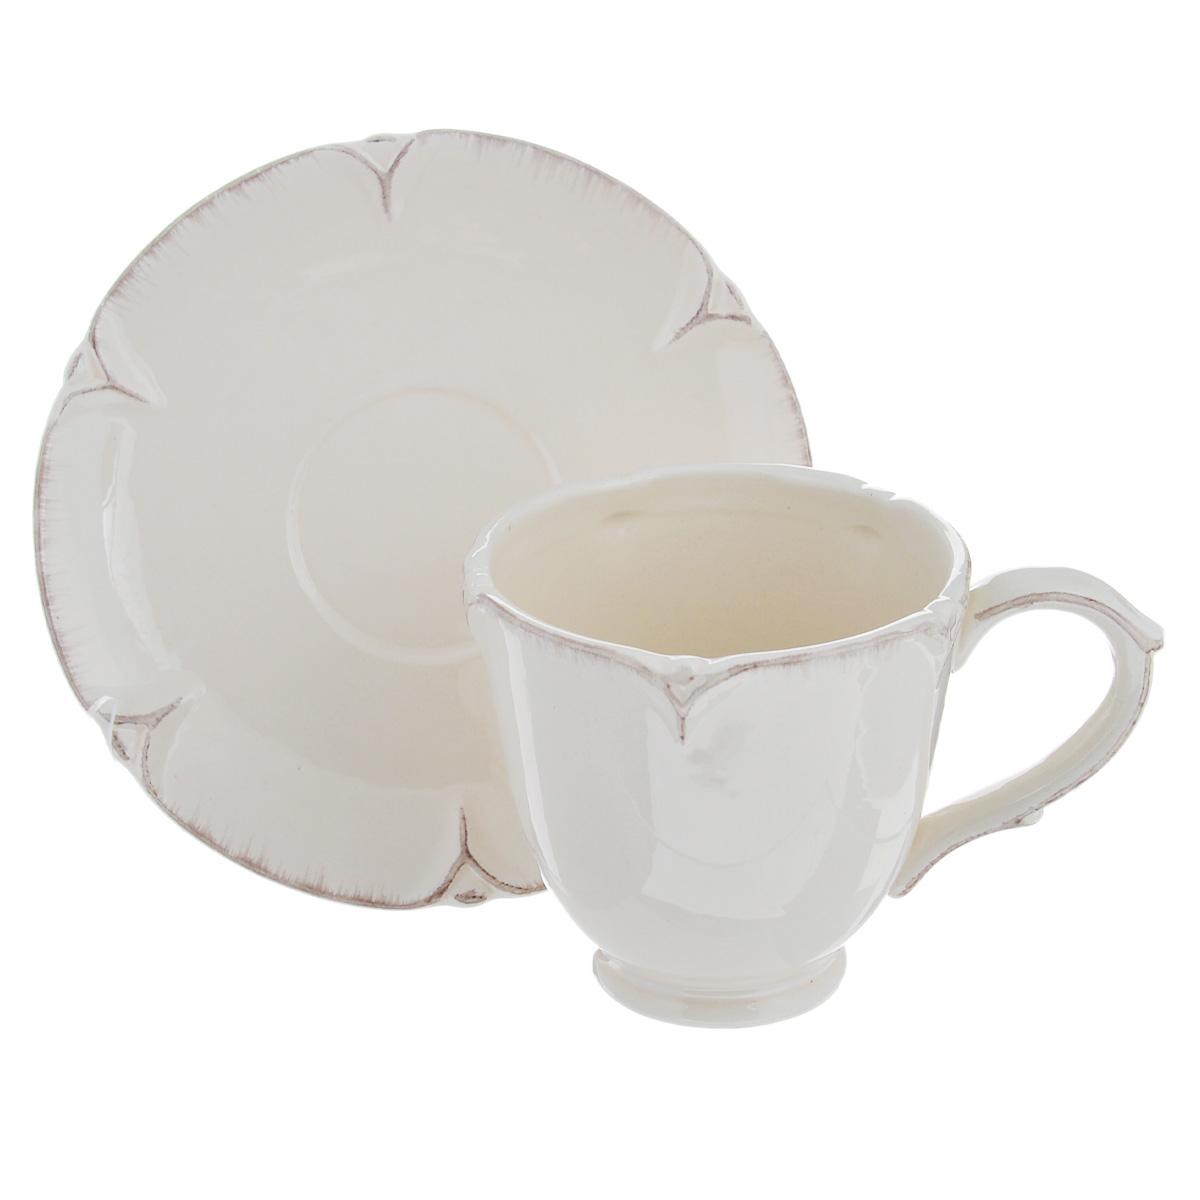 "Чайная пара Lillo ""Ideal"", 2 предмета. 214203"